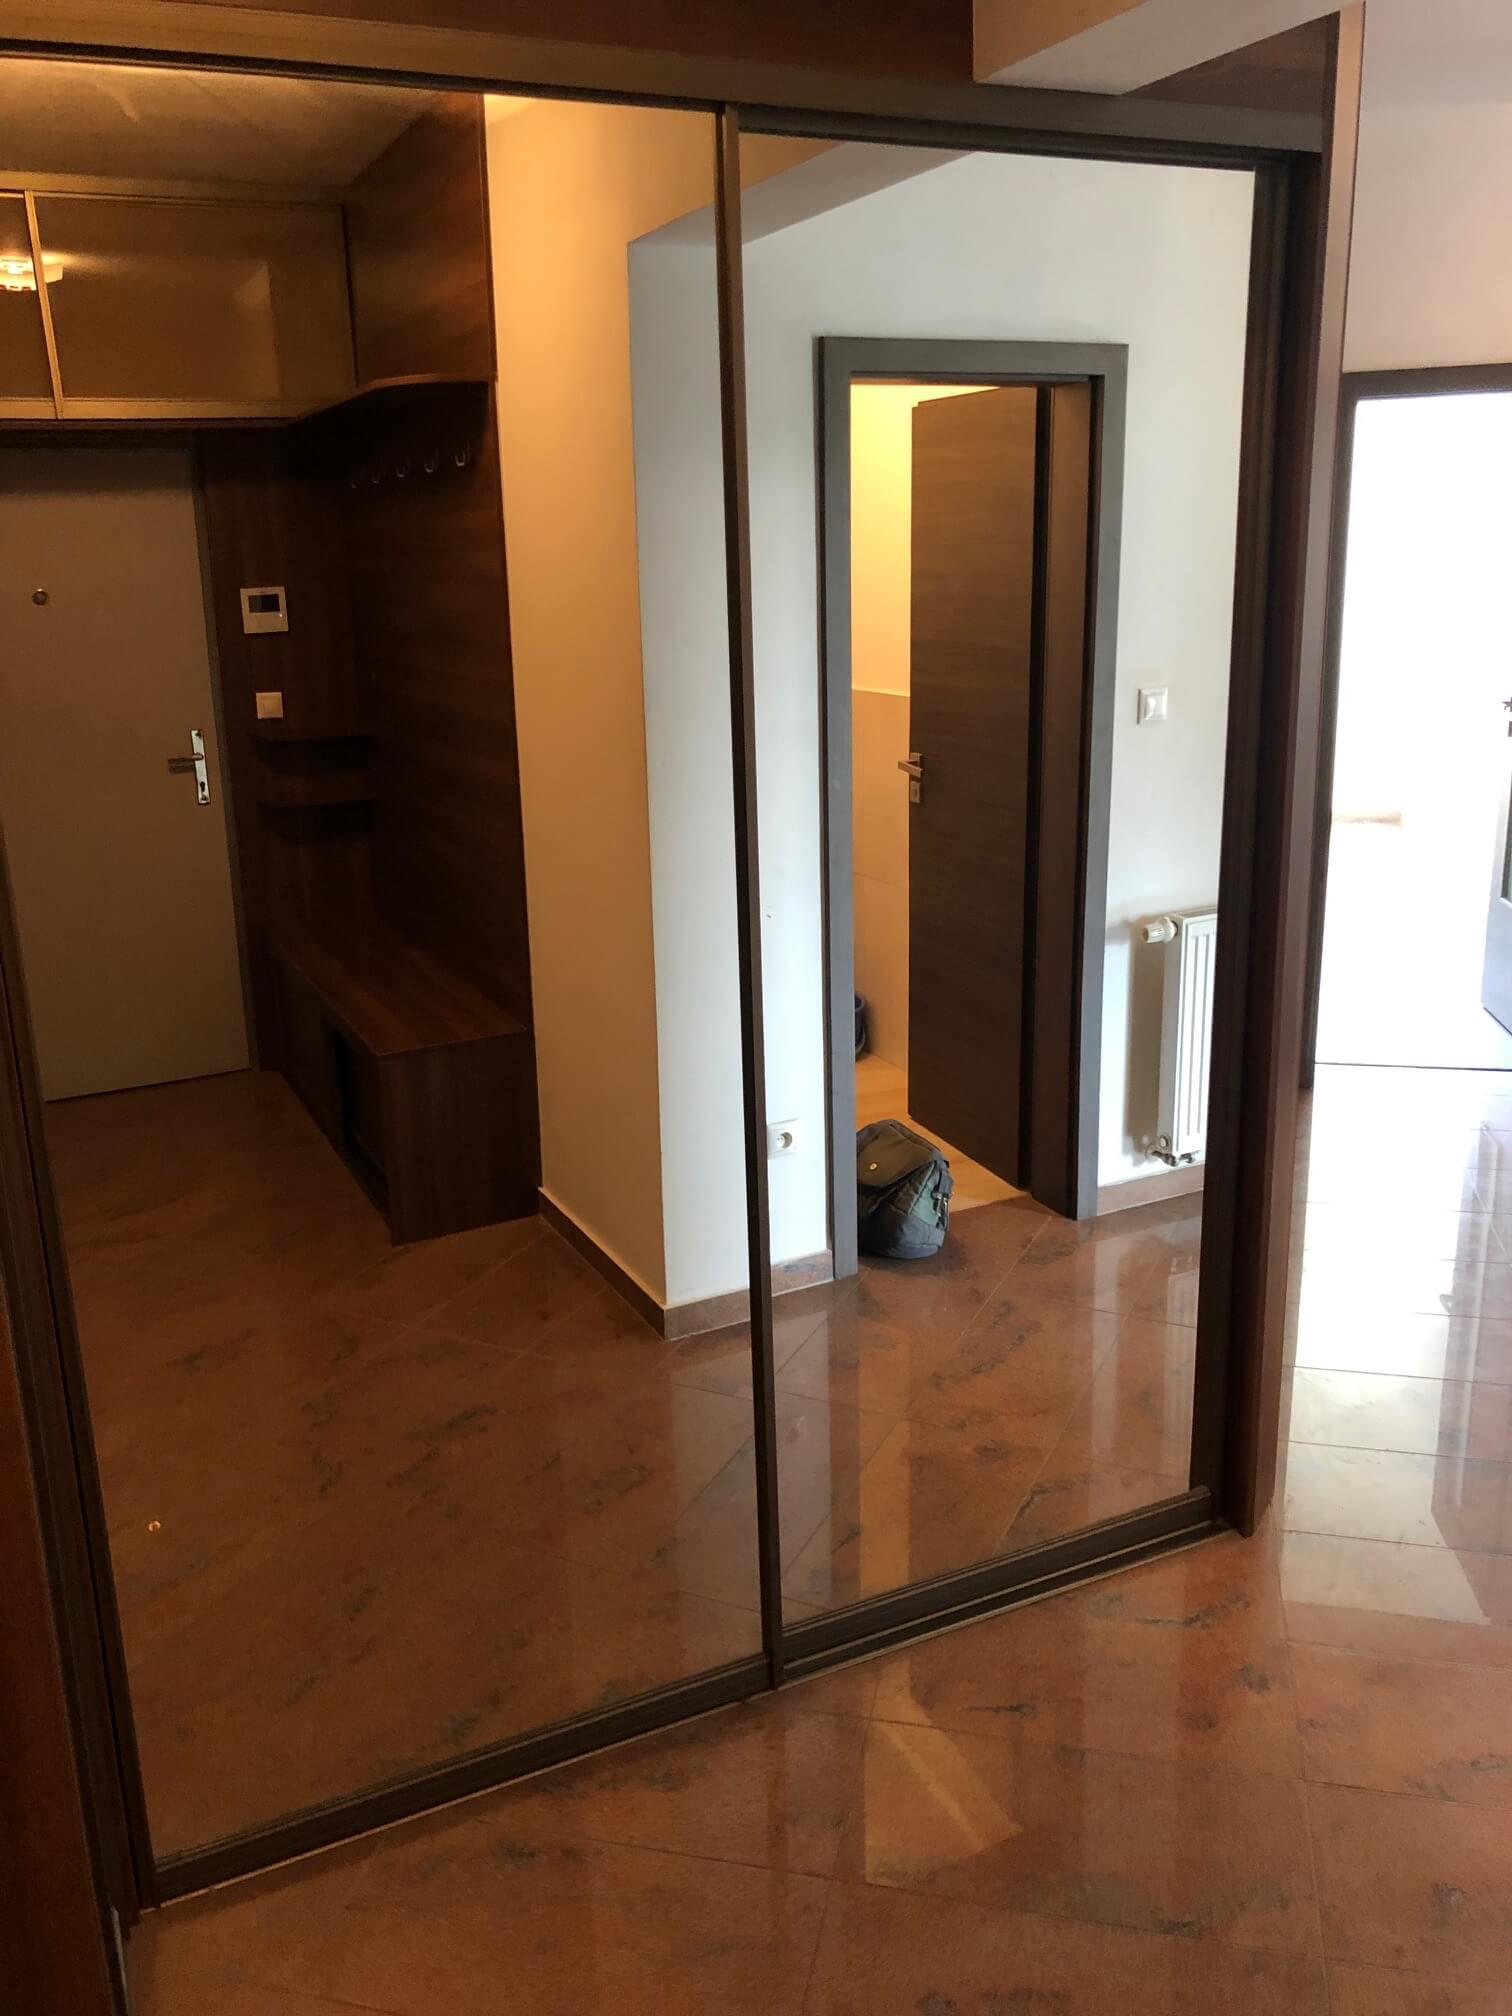 Rezervované: 3 izbový byt, novostavba, 72,25m2, loggia 4,82m2, Staré Grunty, Karlovka, garážové státie-39